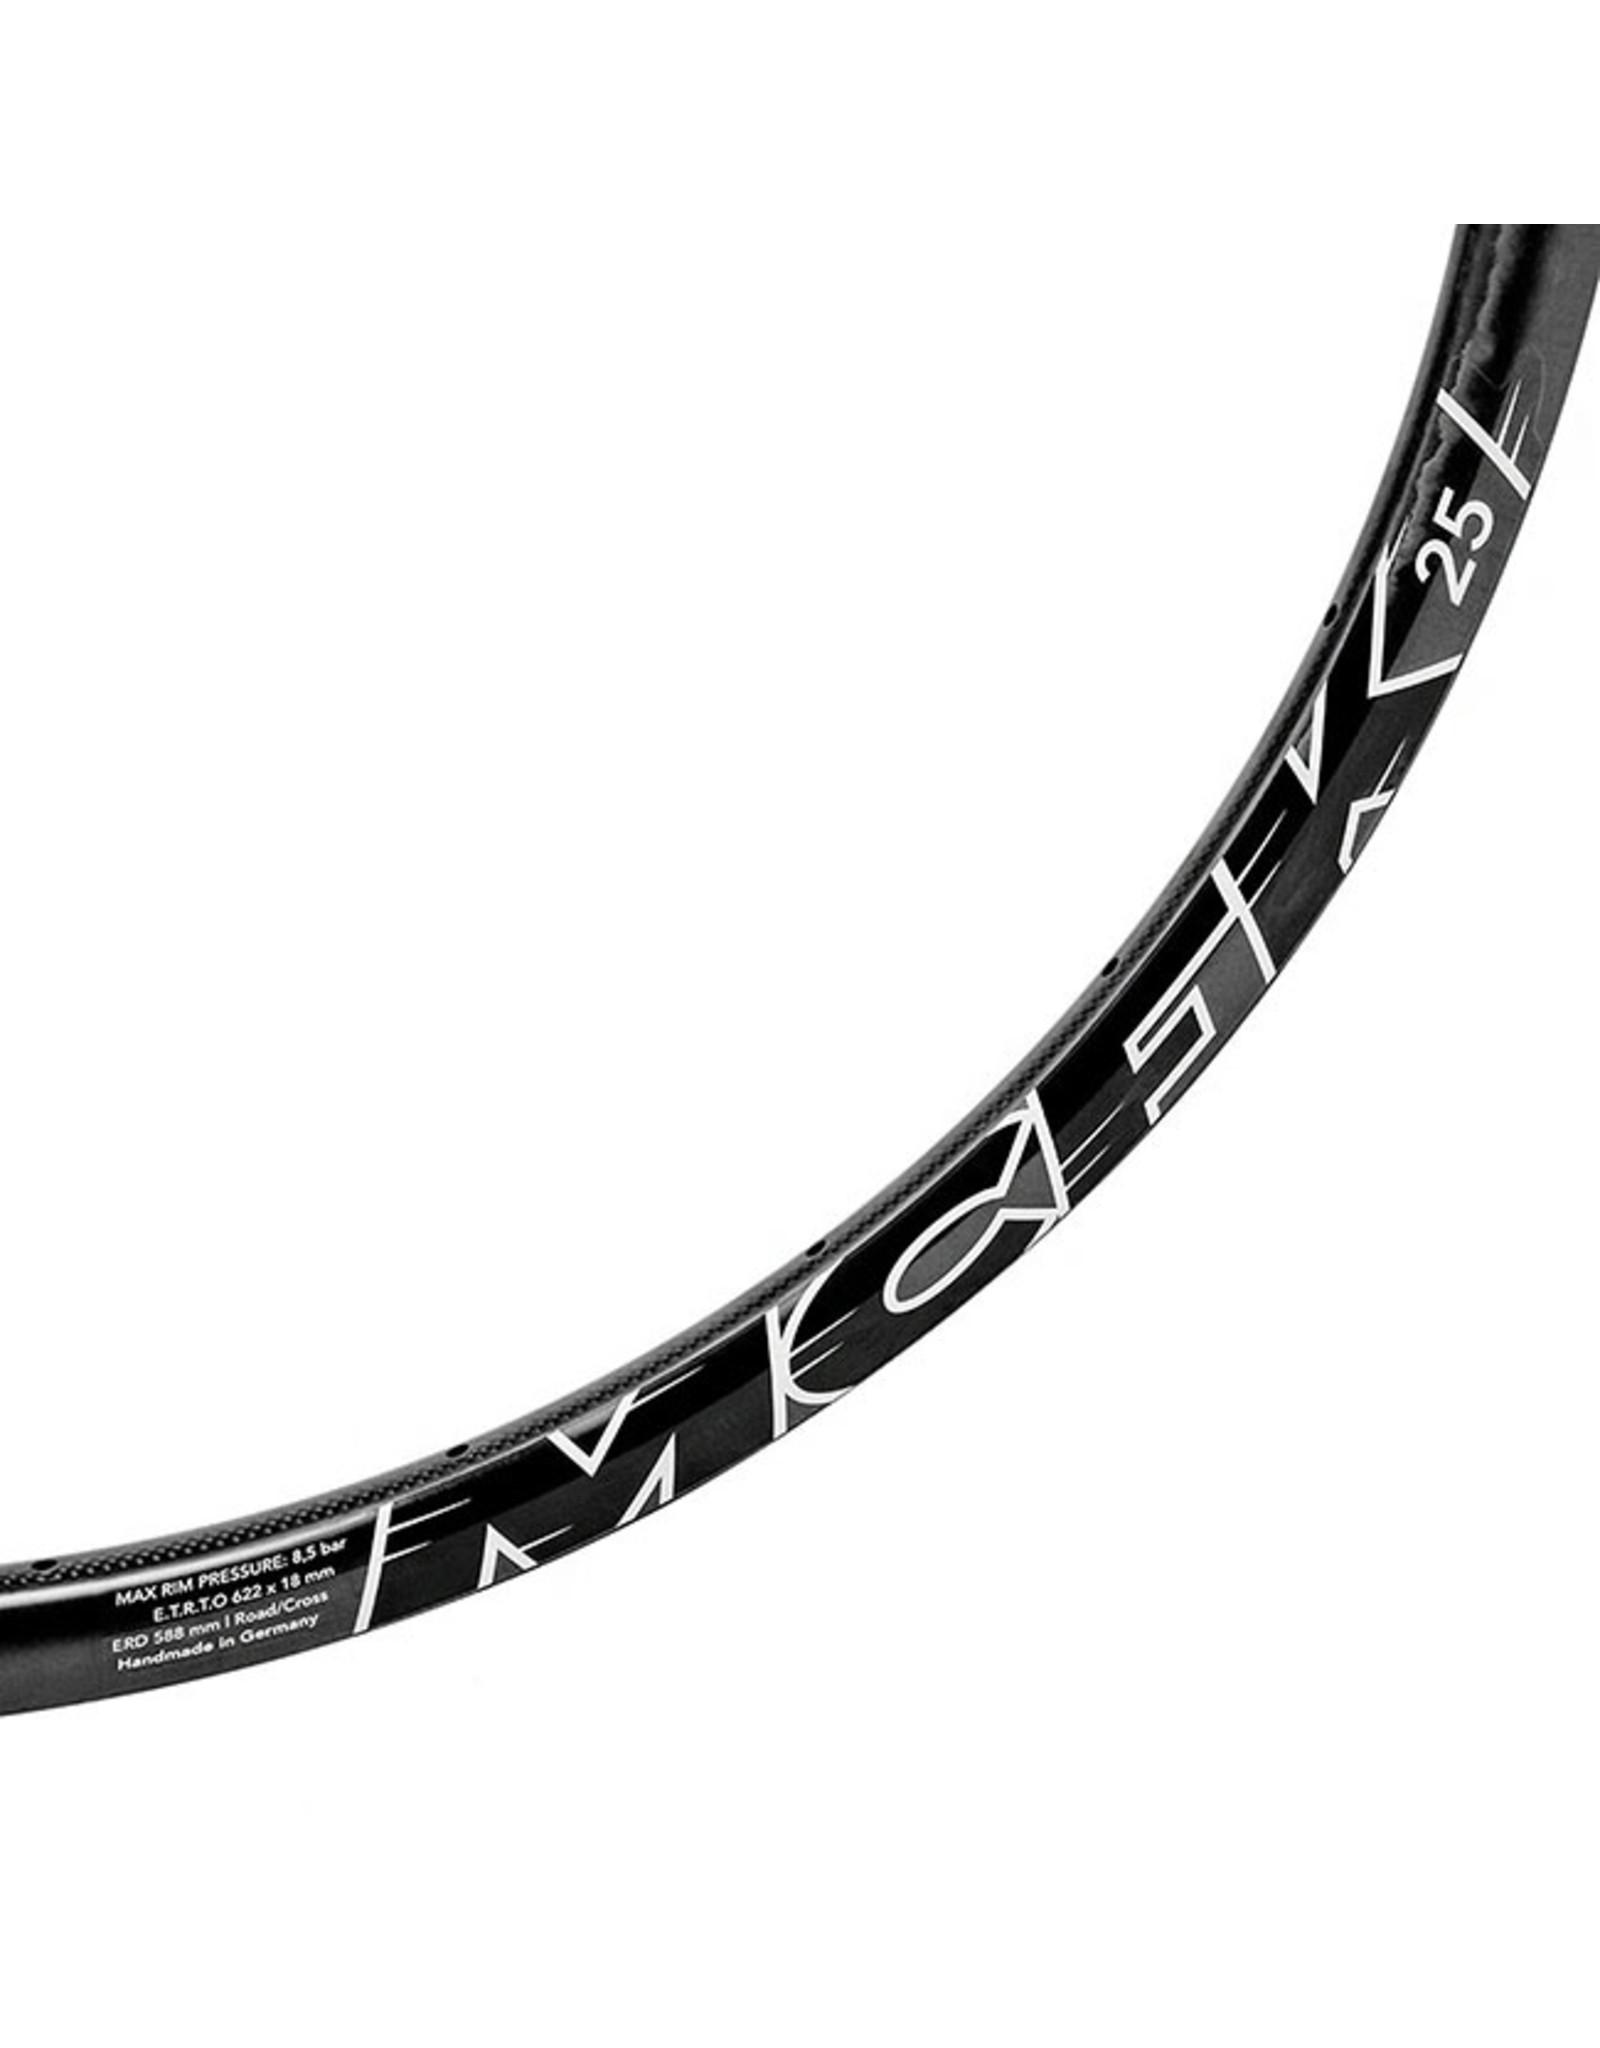 Mcfk Mcfk Carbon Gravel Disc Clincher Rims